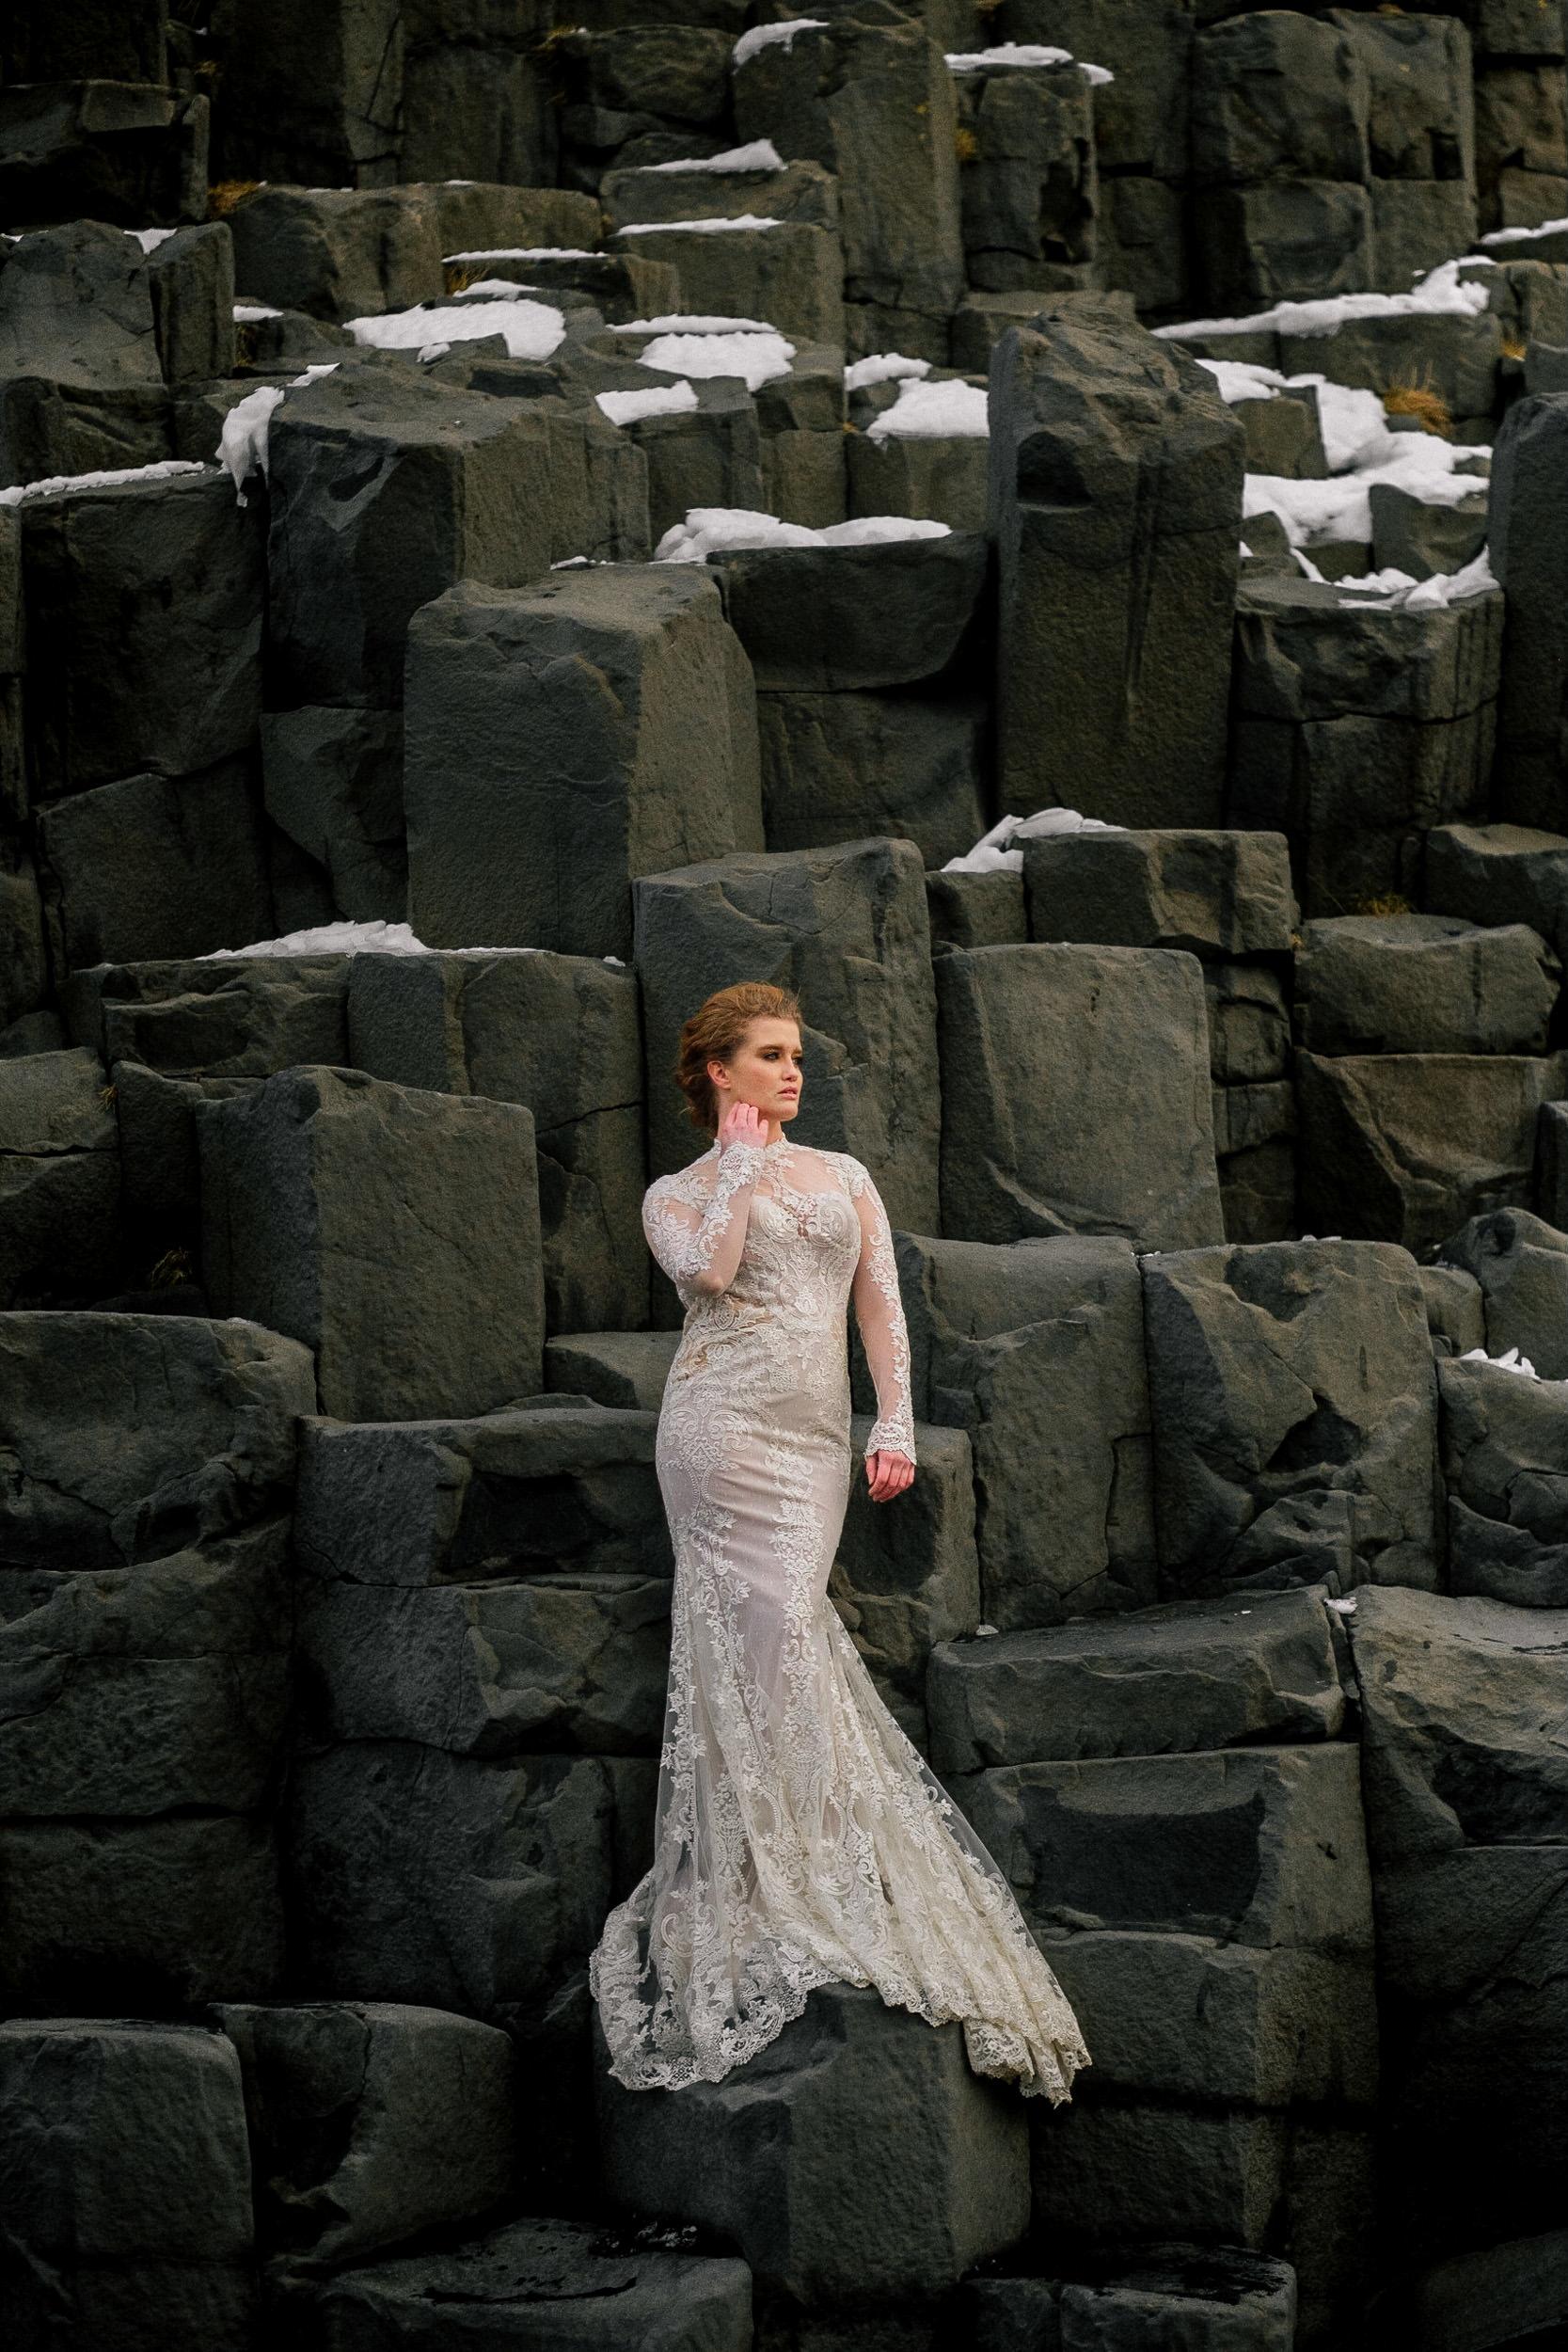 Collective_Wander_Iceland_Photographers_Trip_054.jpg